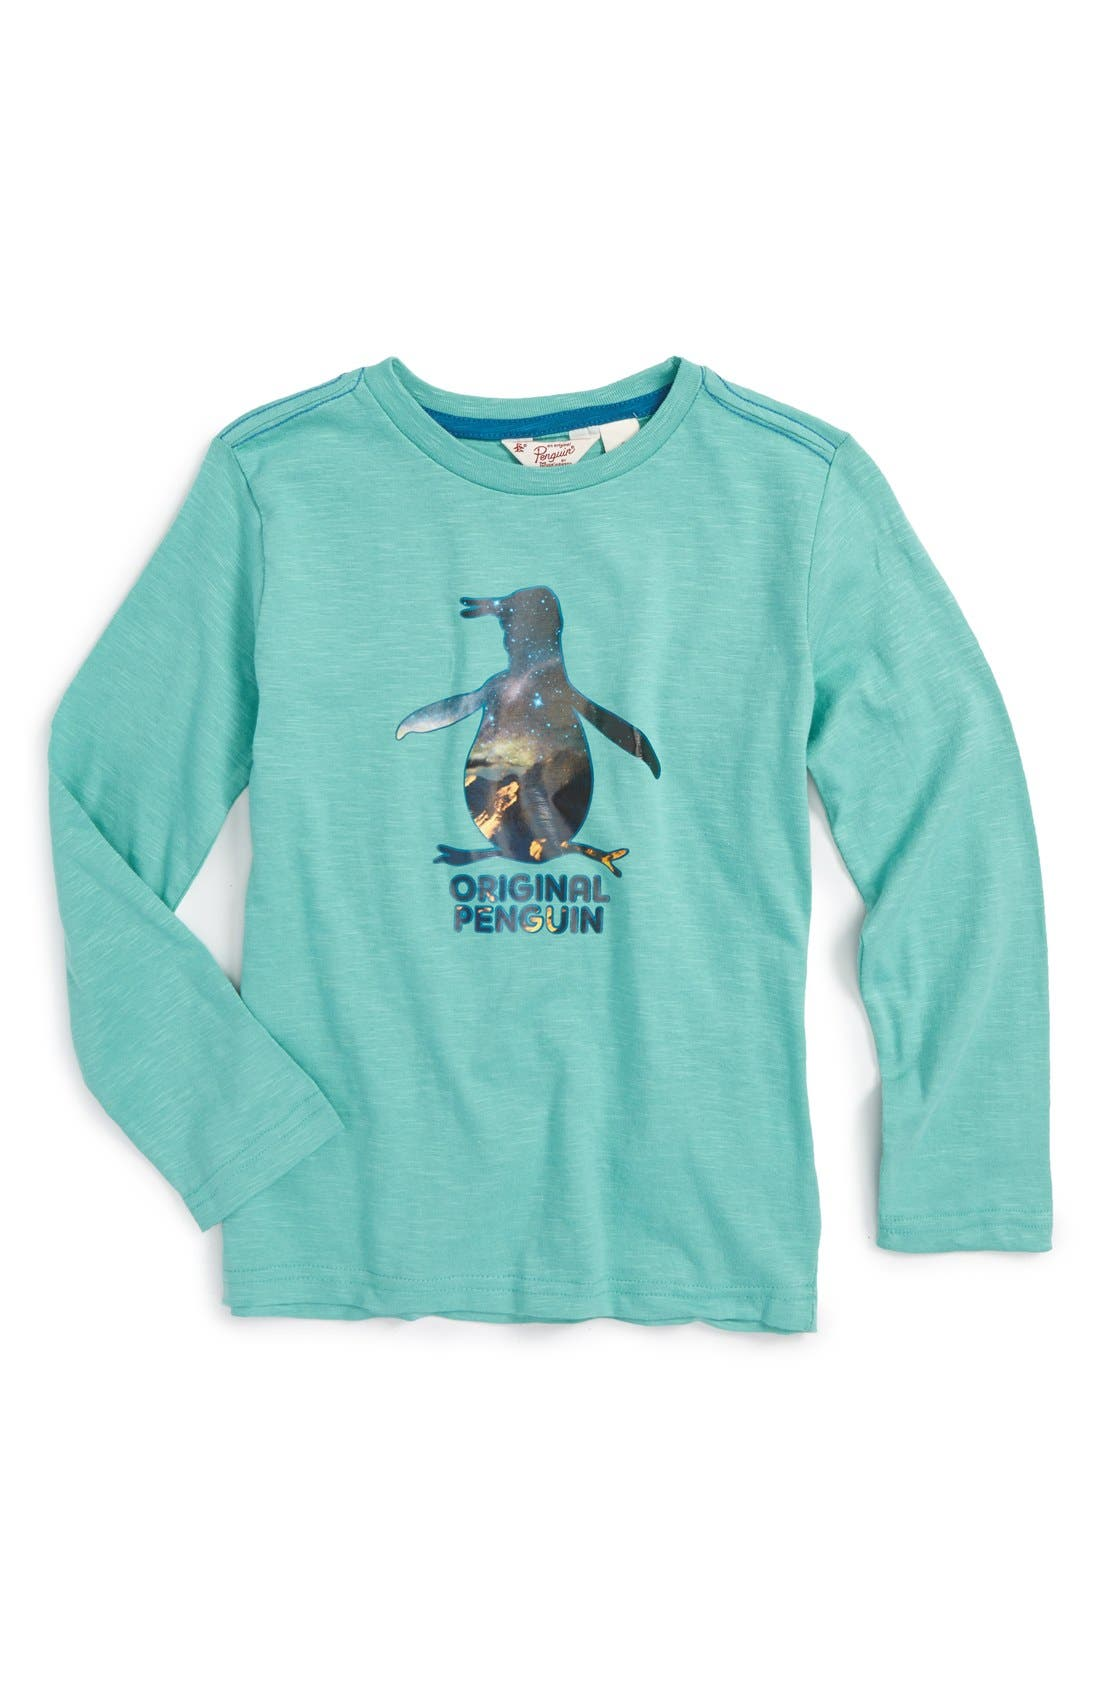 ORIGINAL PENGUIN Iced Pete Long Sleeve Slub Graphic T-Shirt